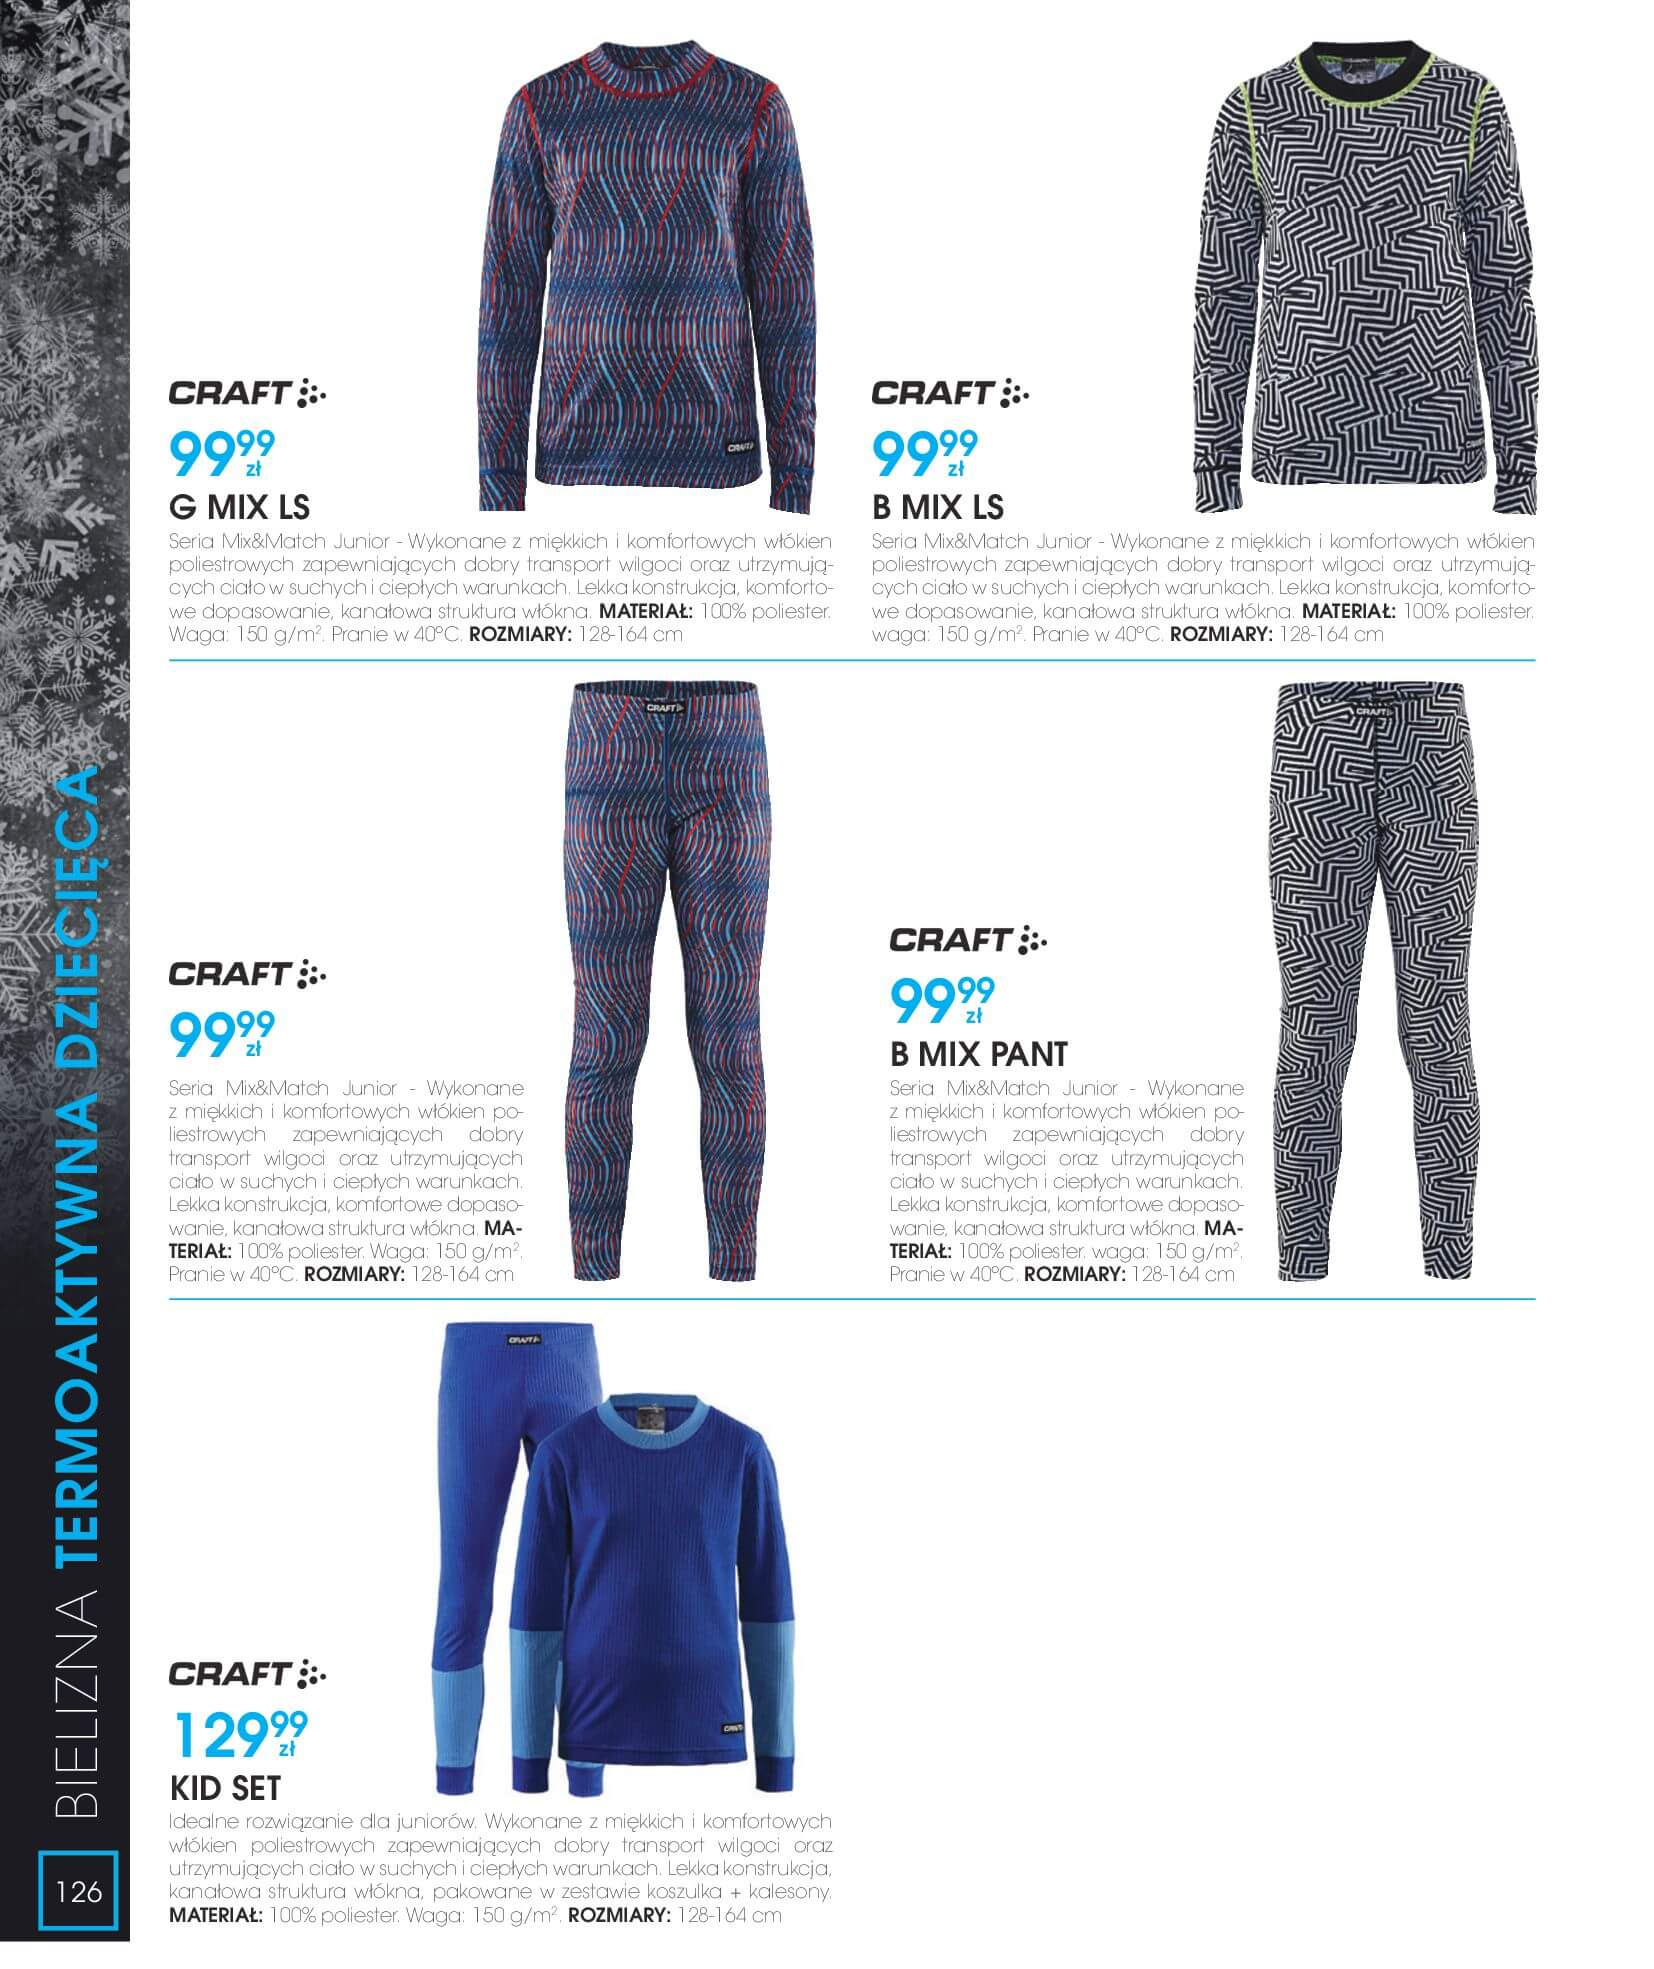 Gazetka Go Sport - Katalog Zima 2017/2018-12.11.2017-28.02.2018-page-126